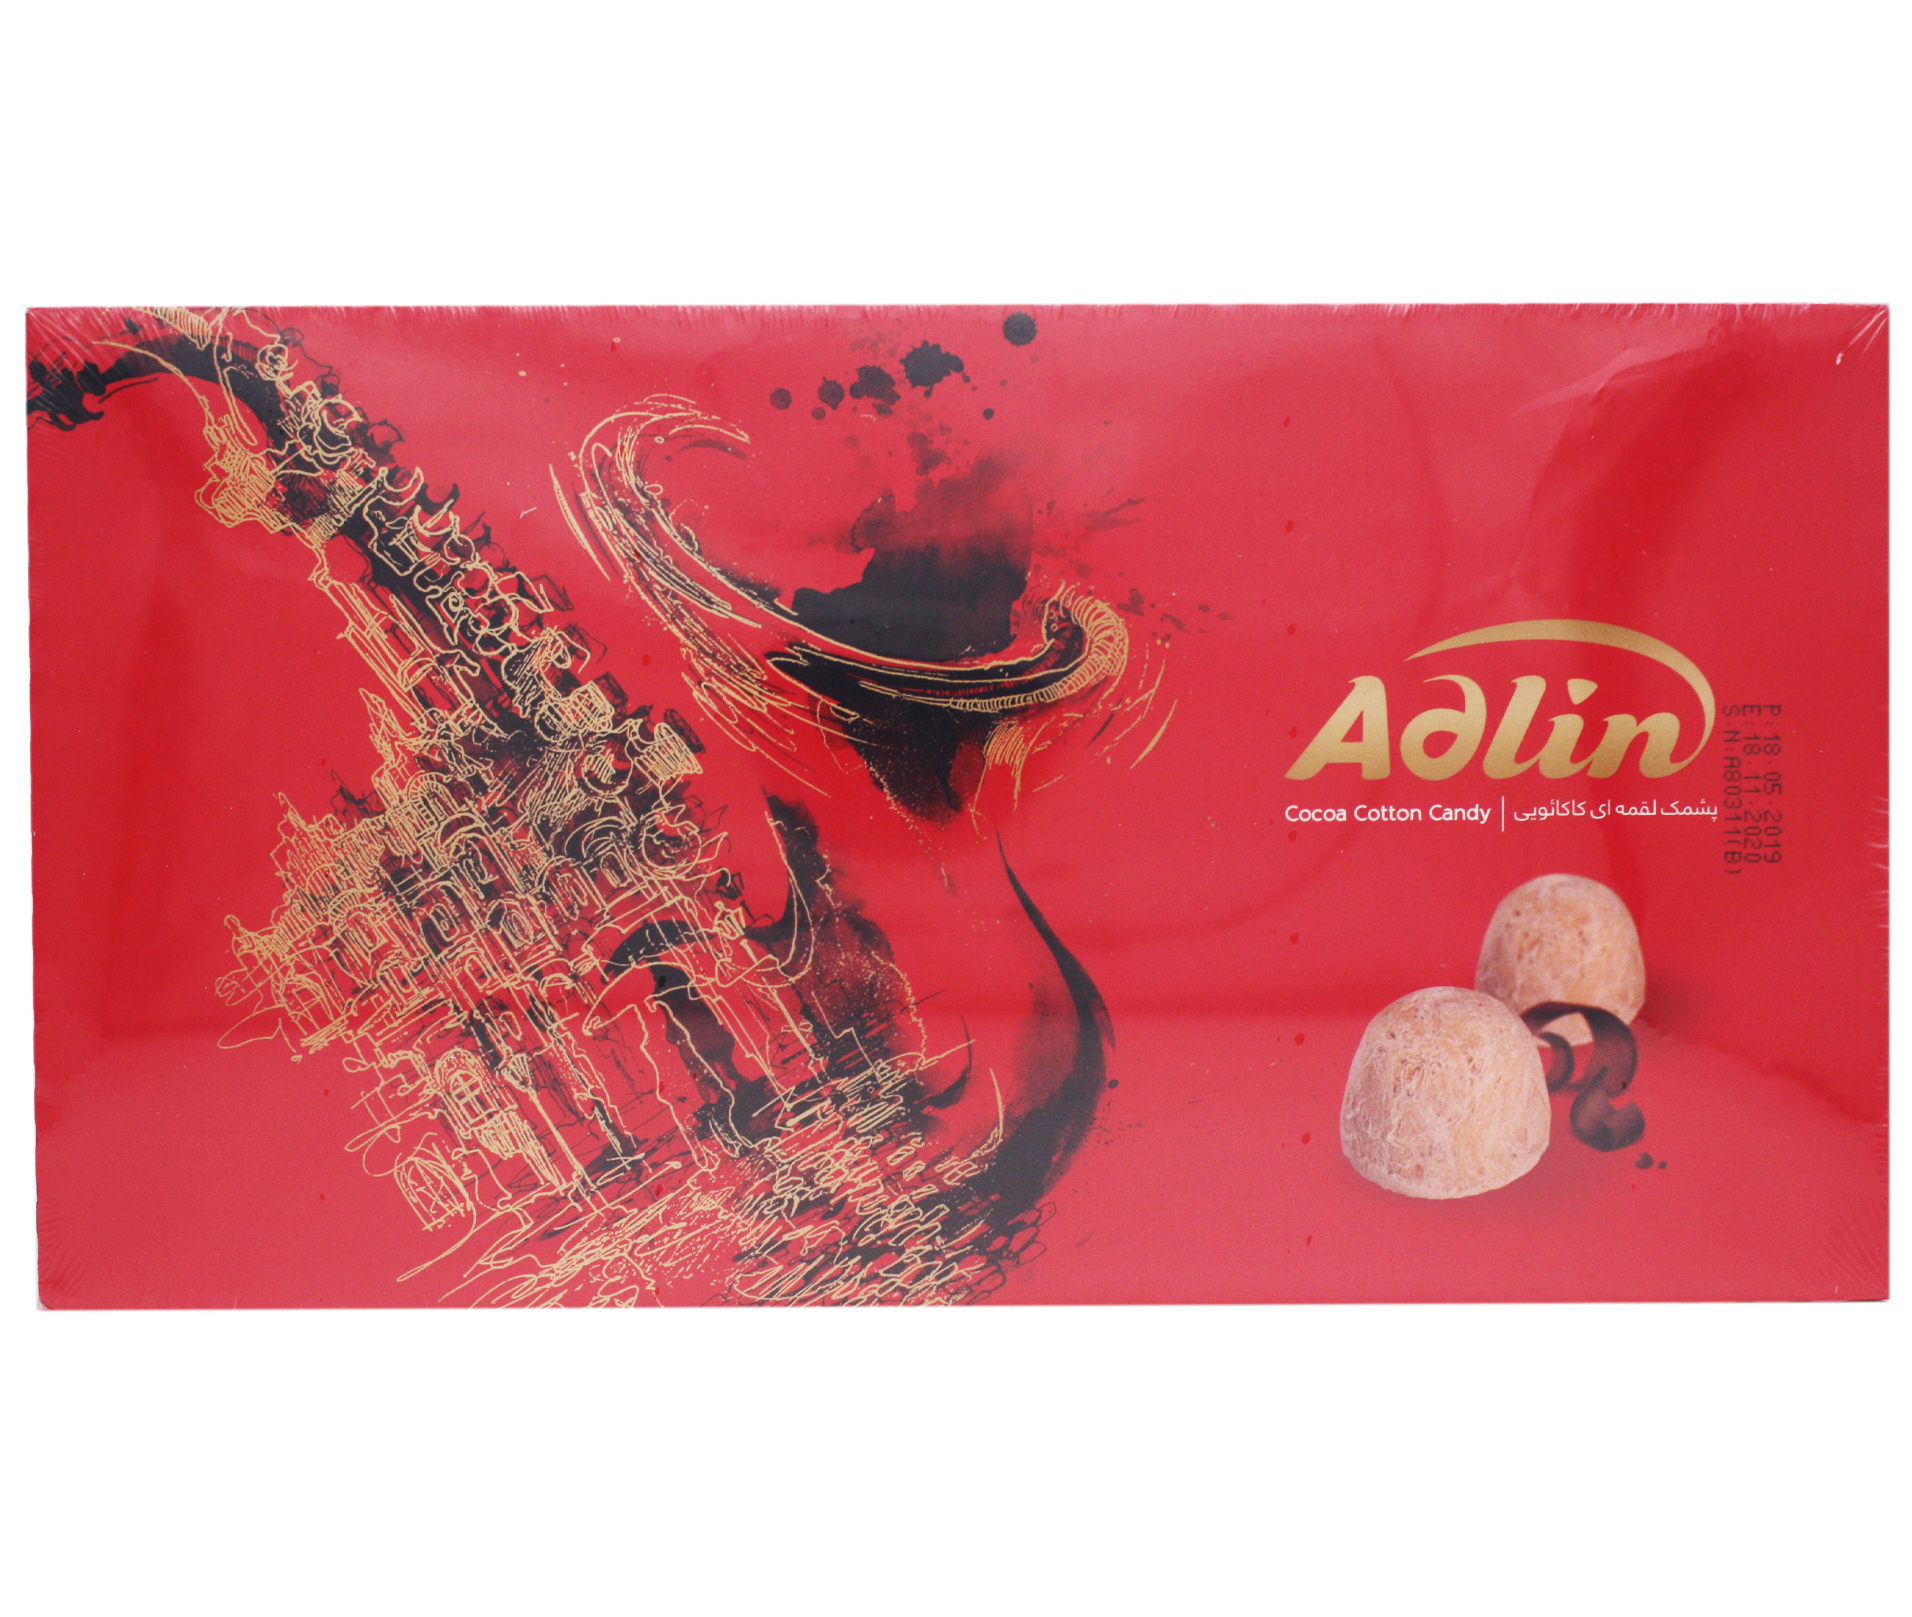 Adlin Царская пишмание с какао, Adlin, 350 г import_files_24_24830af7bf3911e9a9b1484d7ecee297_a7debf6ddb7611e9a9b6484d7ecee297.jpg